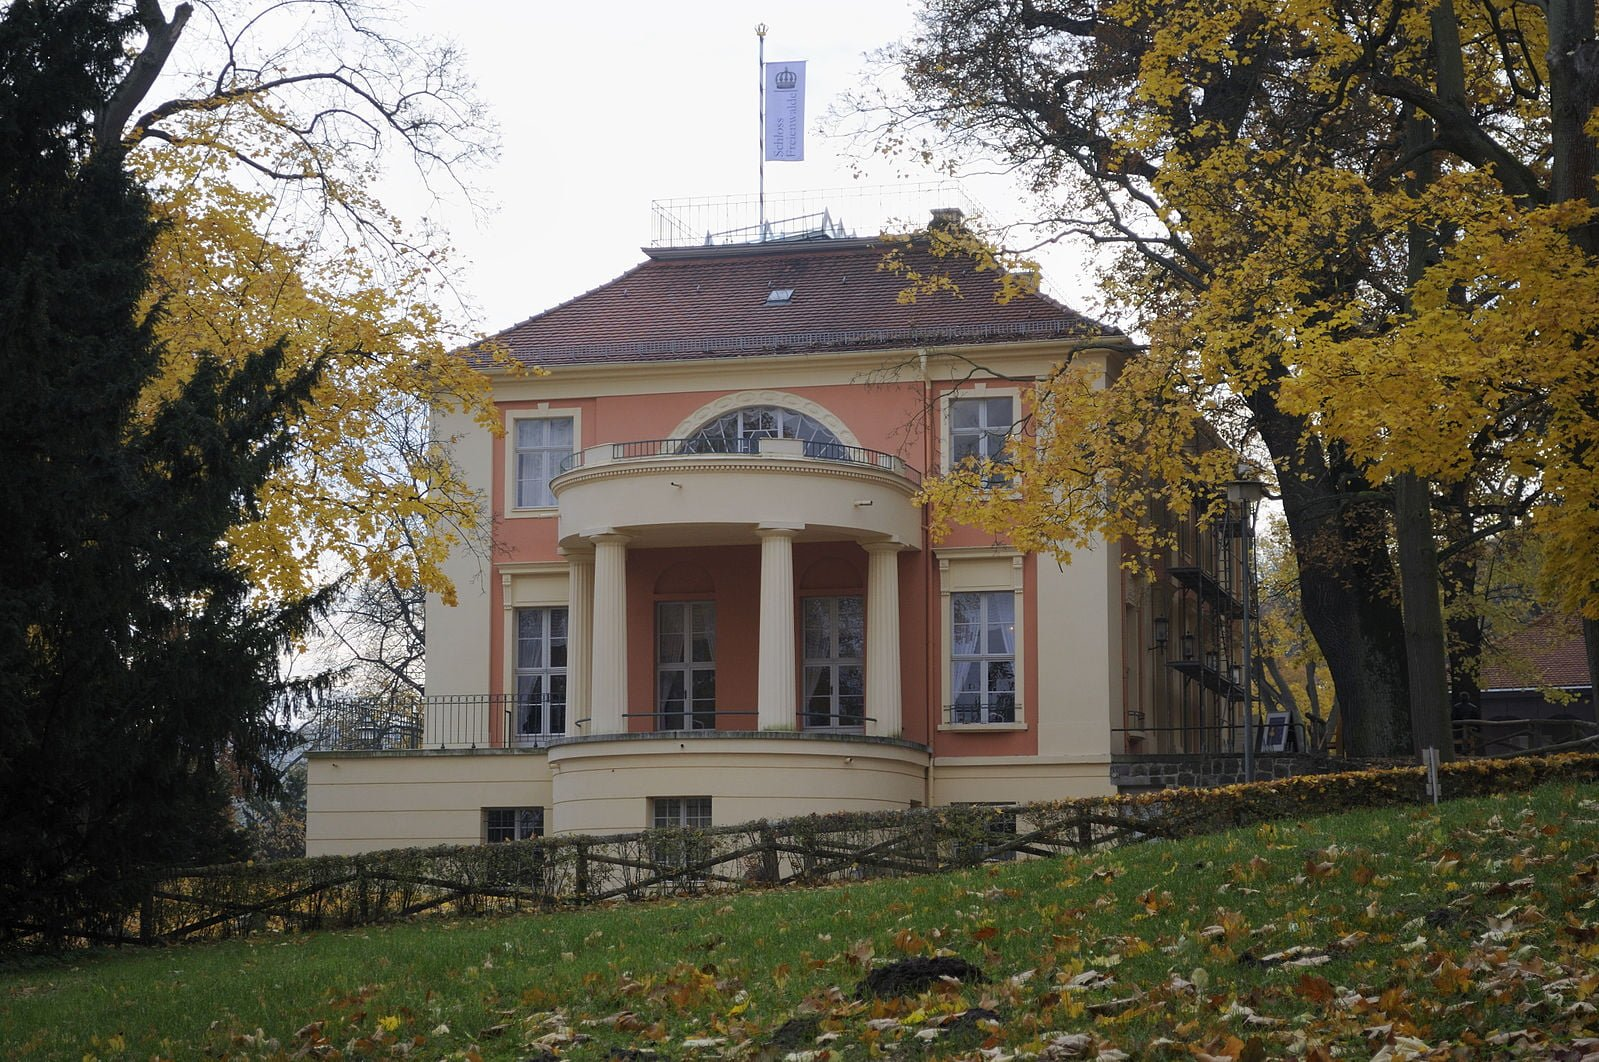 Schloss Freienwalde. (Photo: DerHexer, via CC Attribution-Share Alike 3.0 via wikimedia)